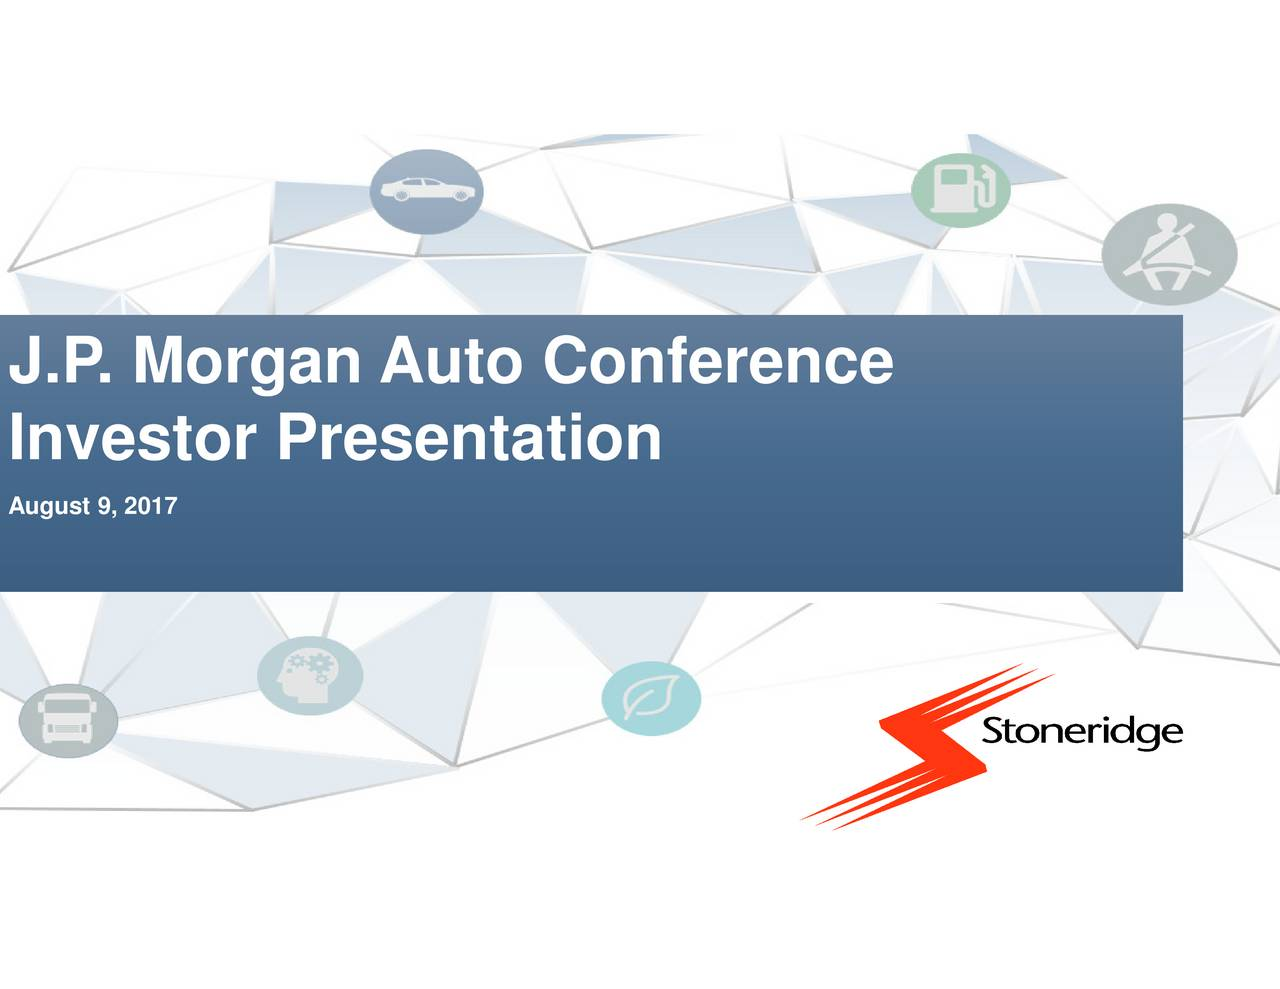 Stoneridge Sri Presents At J P Morgan Auto Conference Slideshow